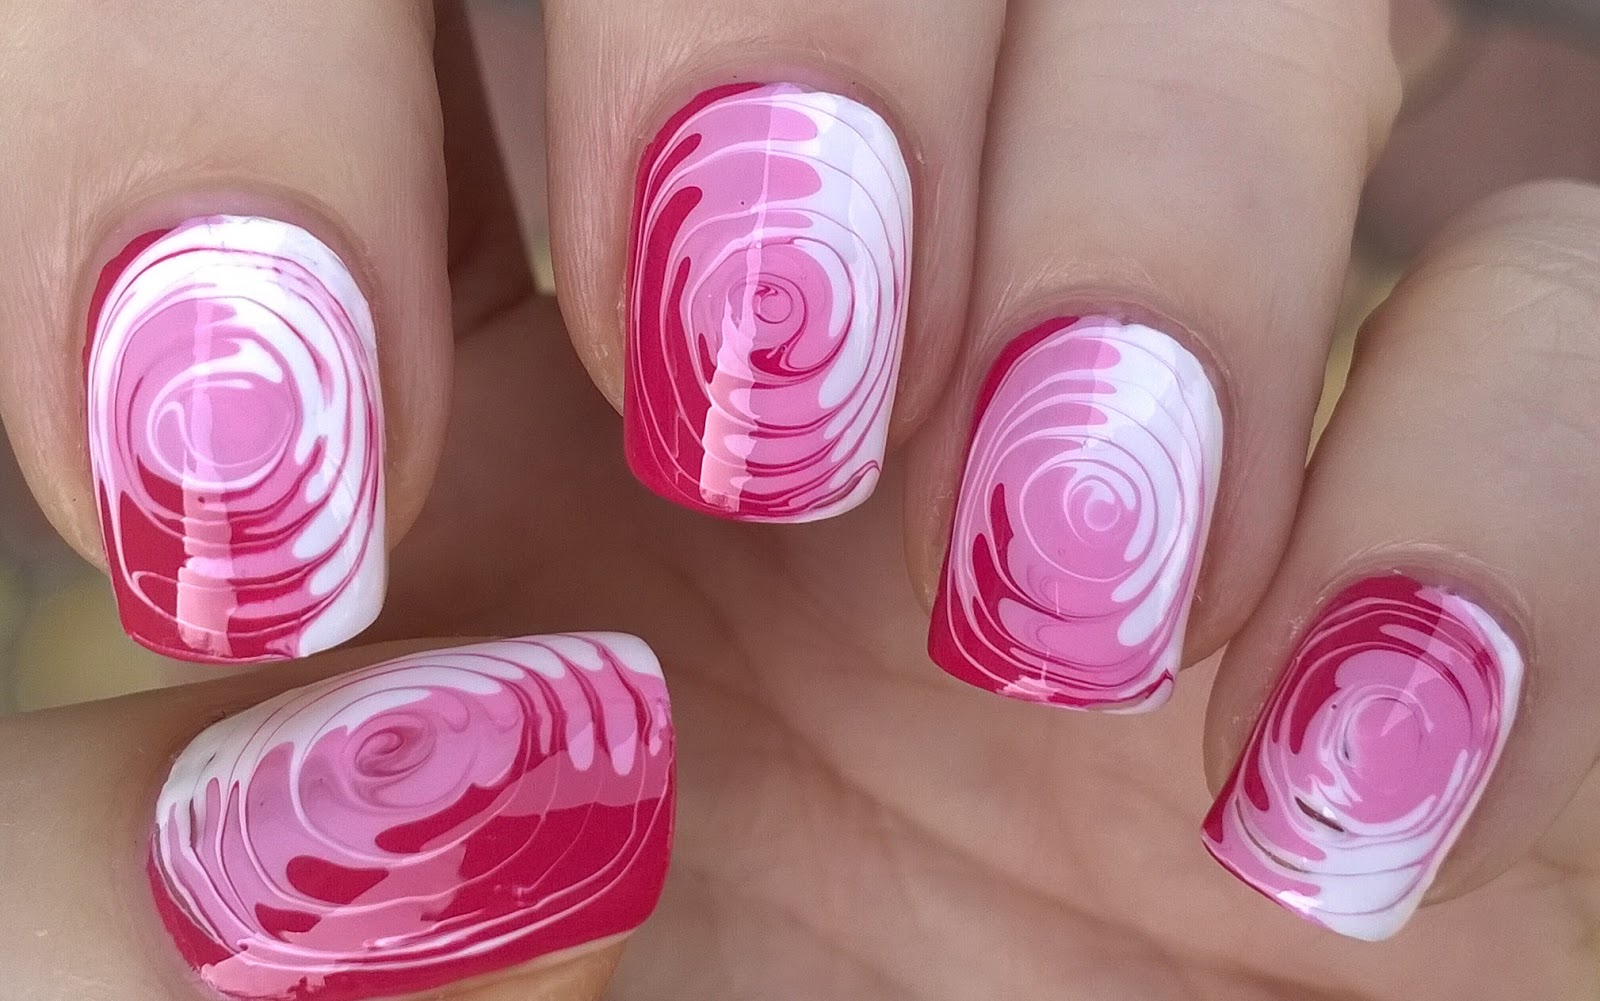 Life World Women Tricolor Swirl Nail Art Pink Toothpick Nail Idea